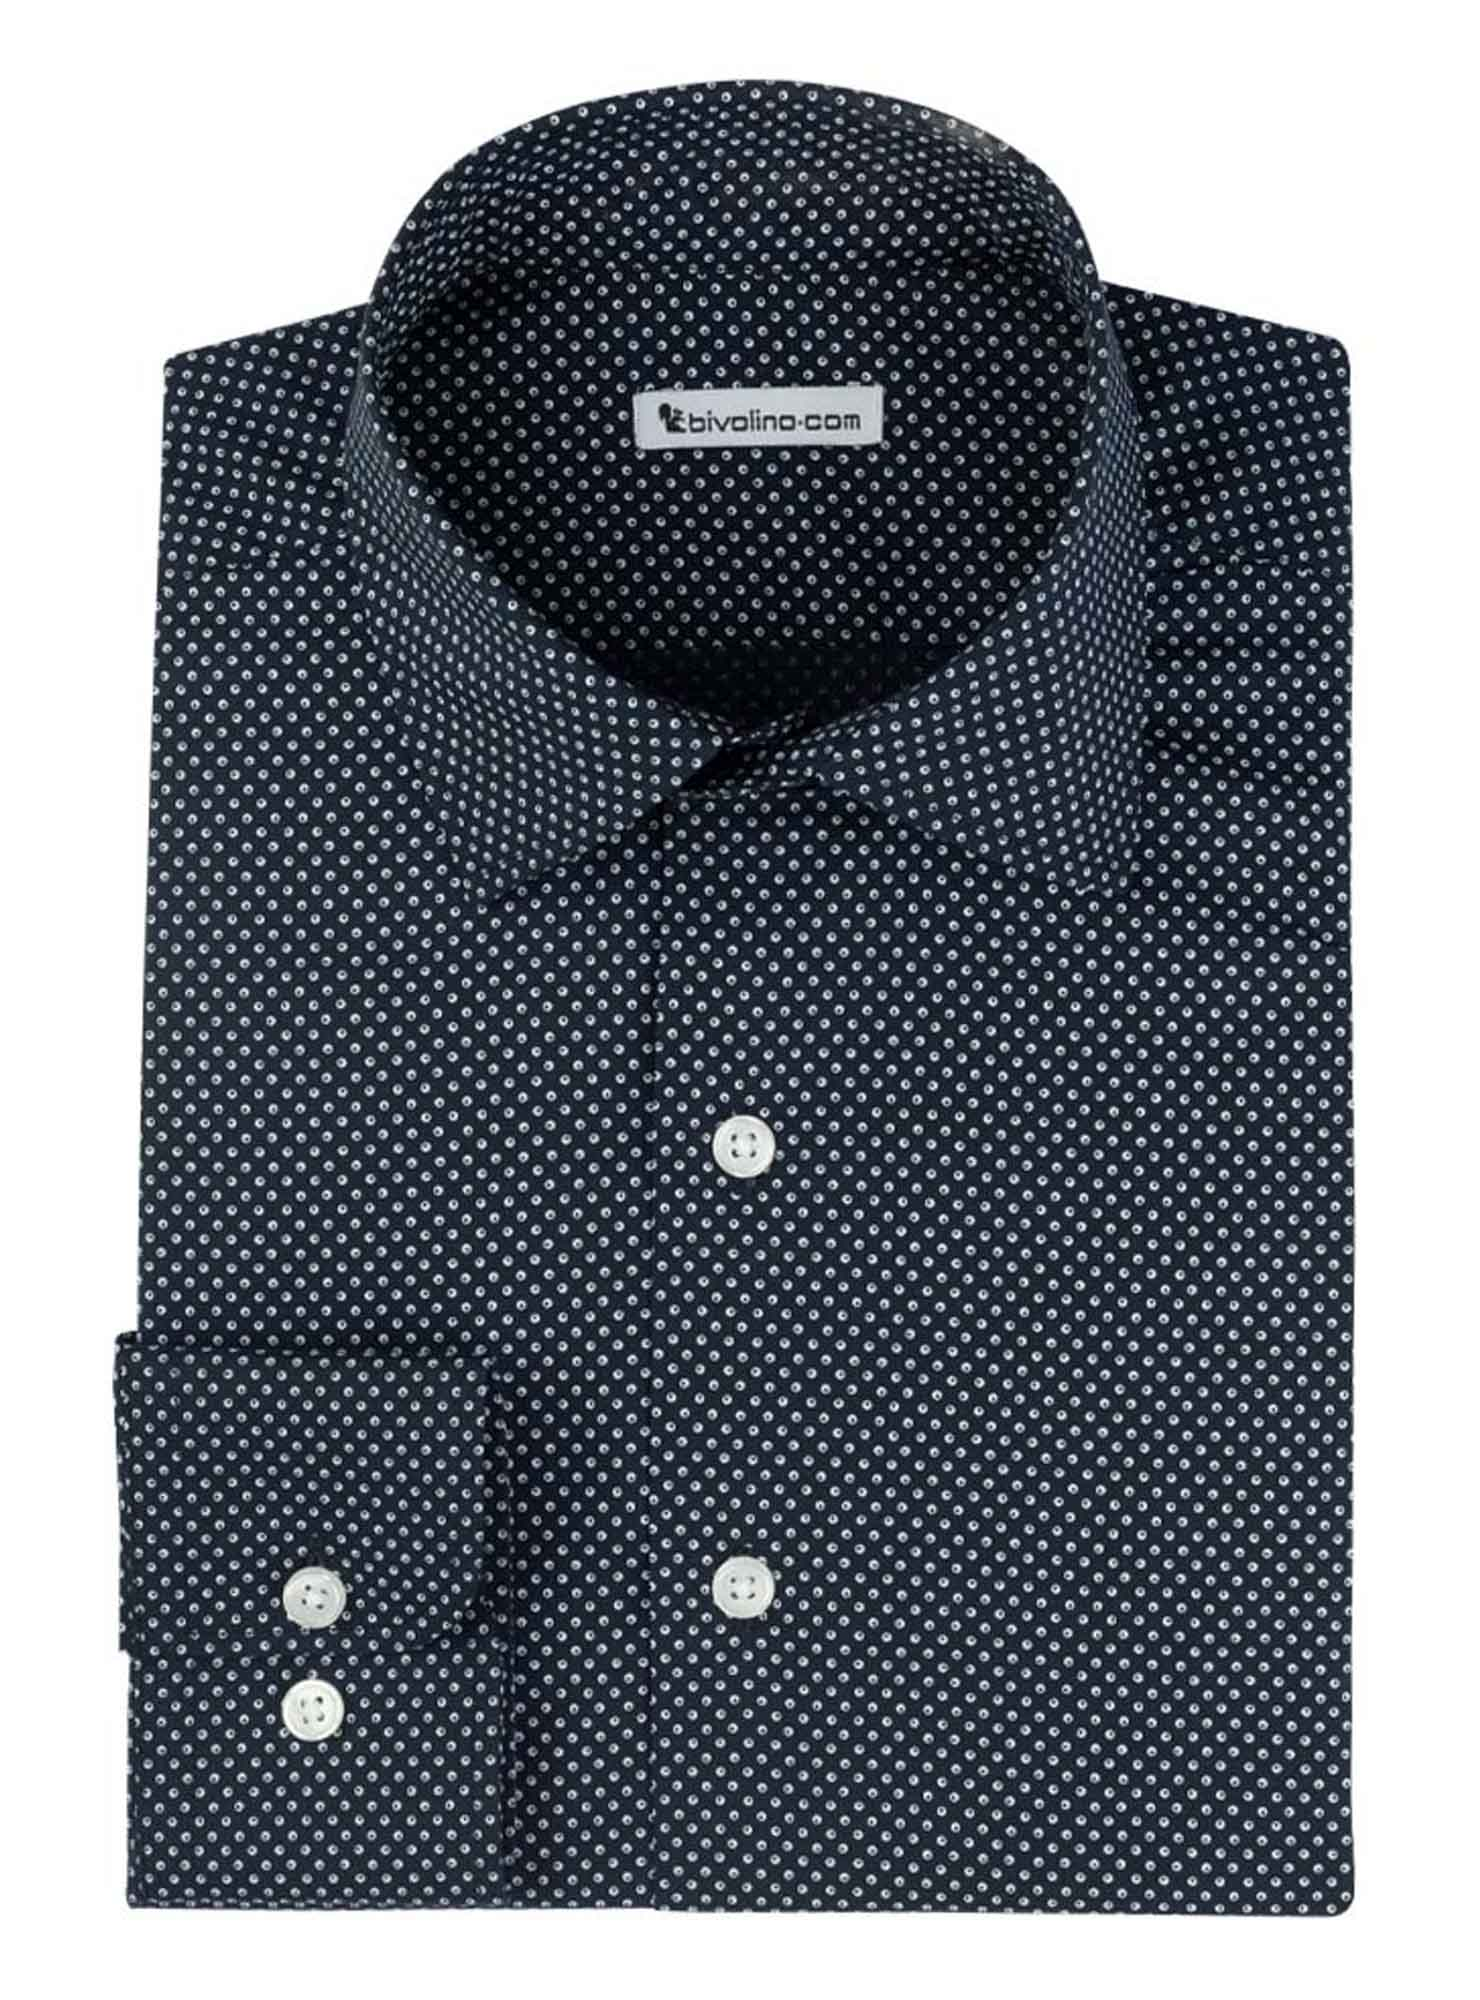 LARIANO  - Männerhemd Baumwolle  Micro-Print Punkten- MICRO 8